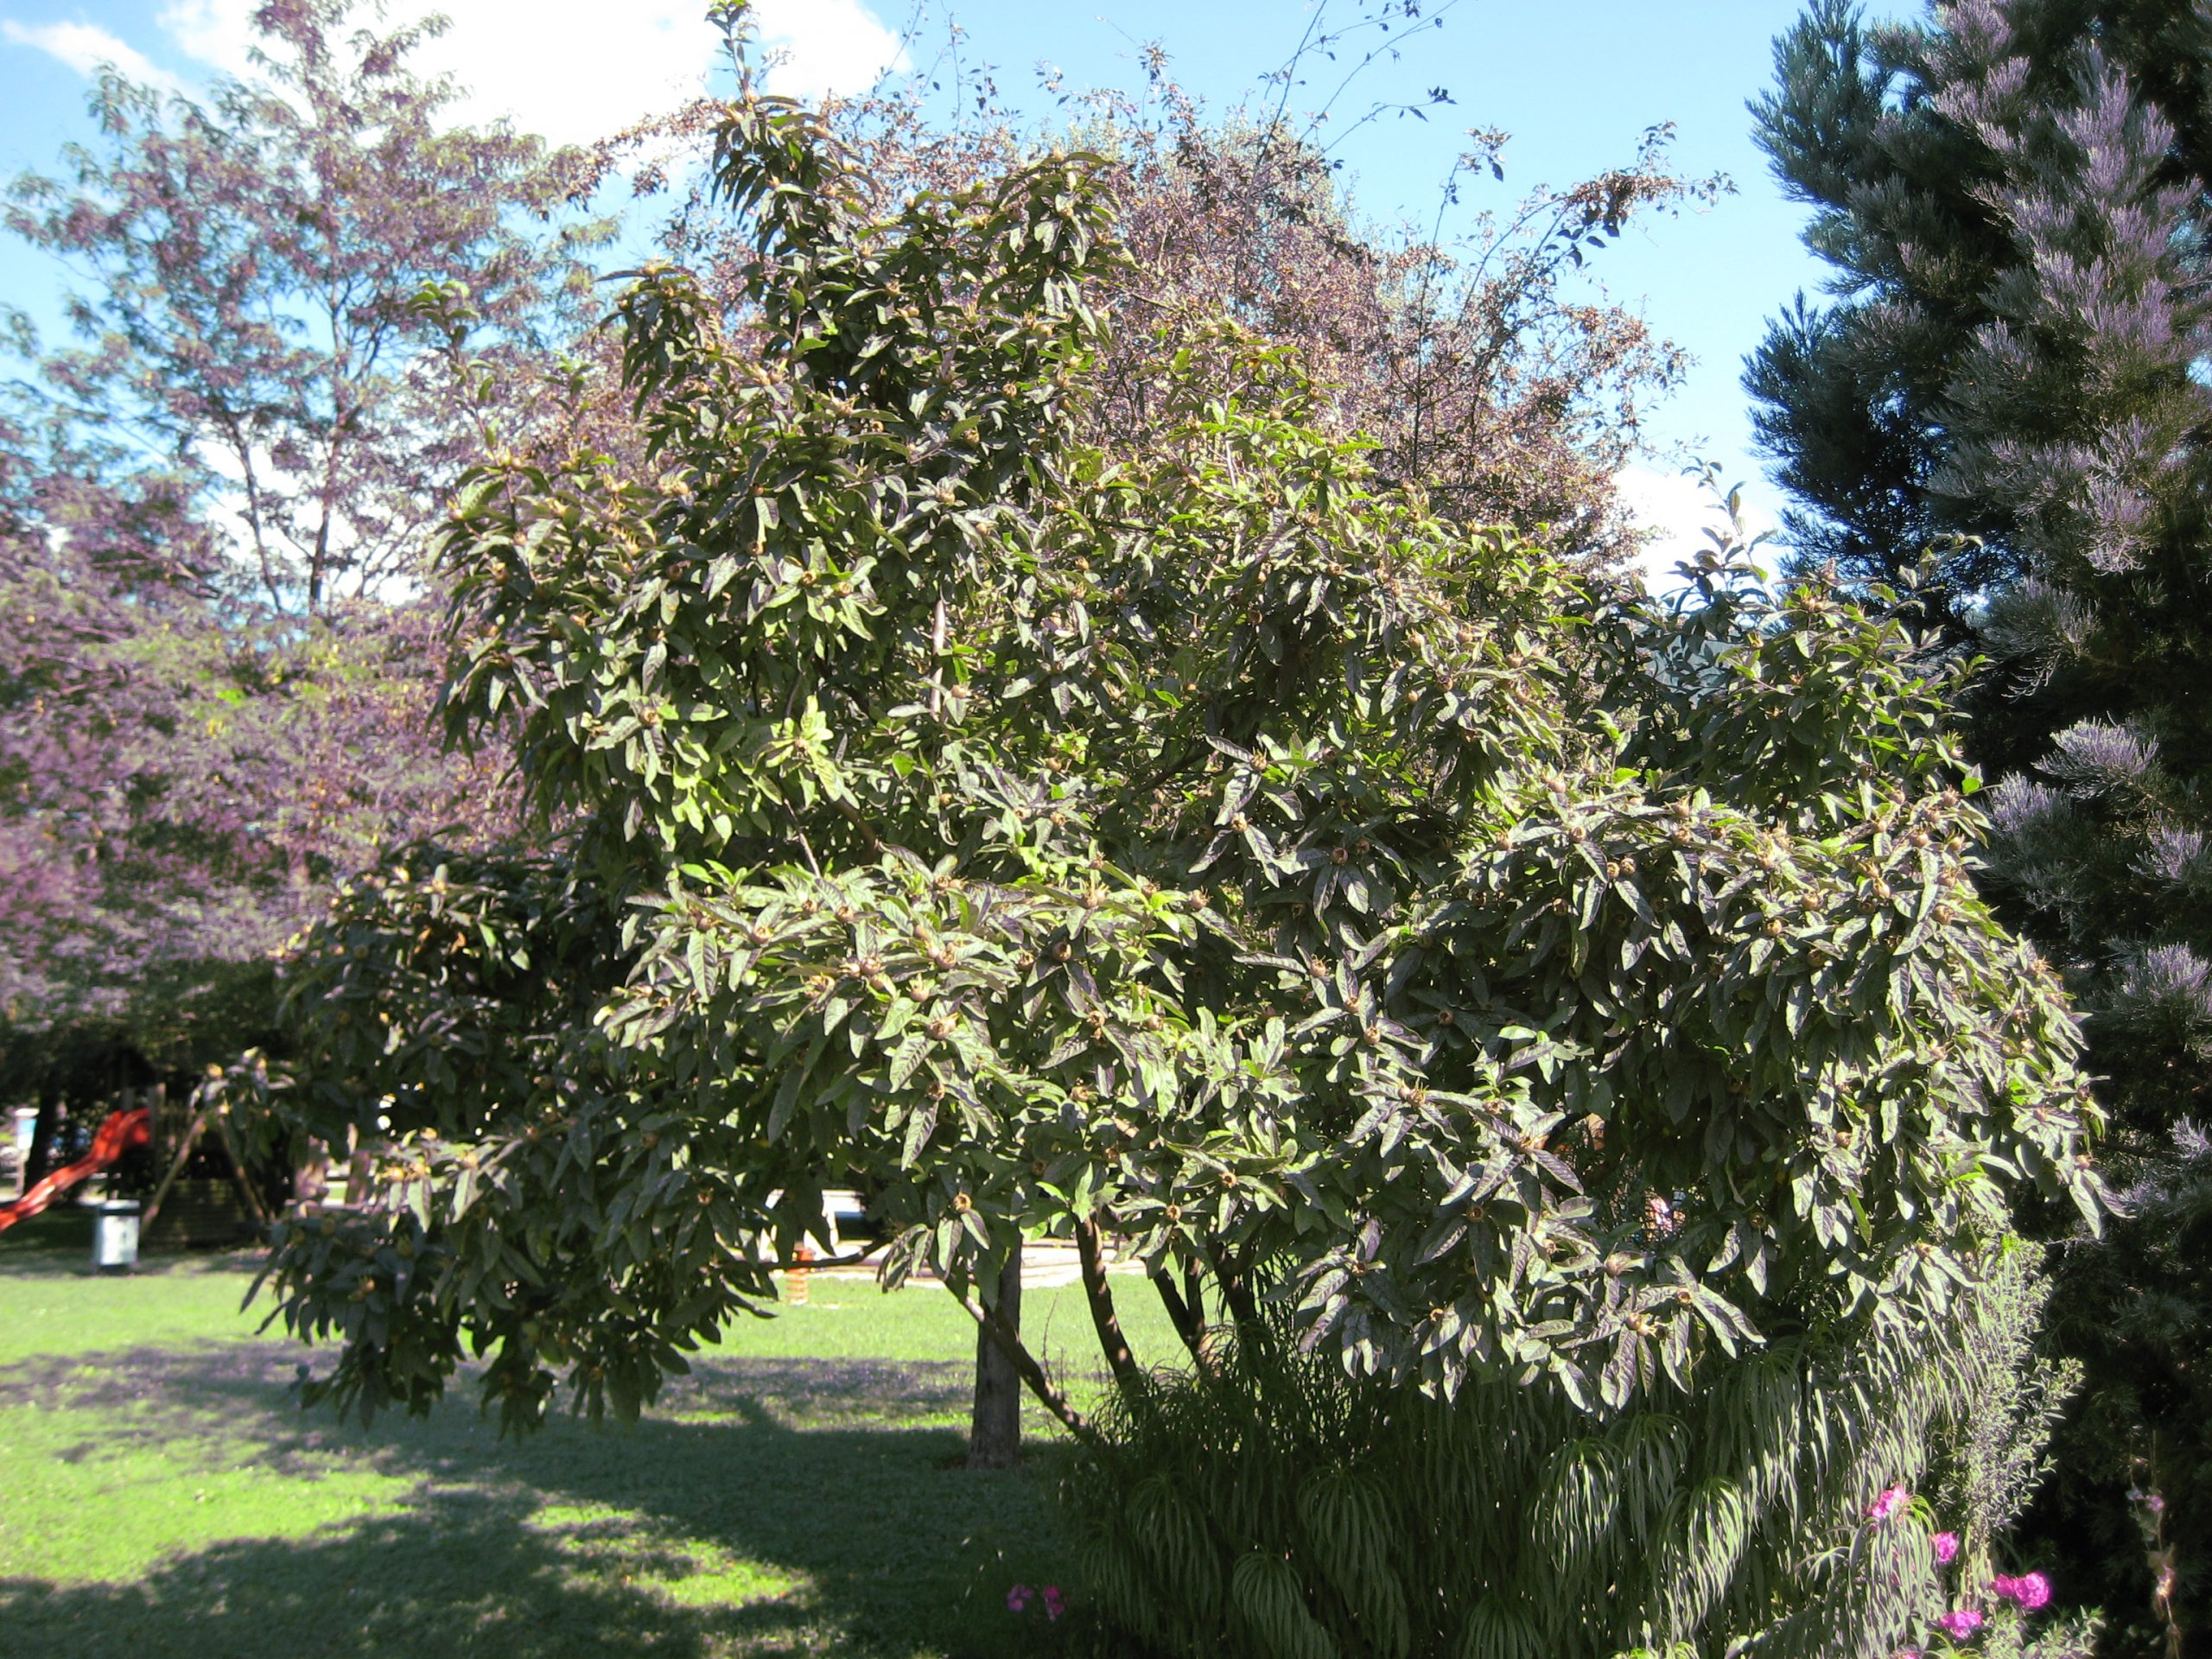 árbol del níspero europeo